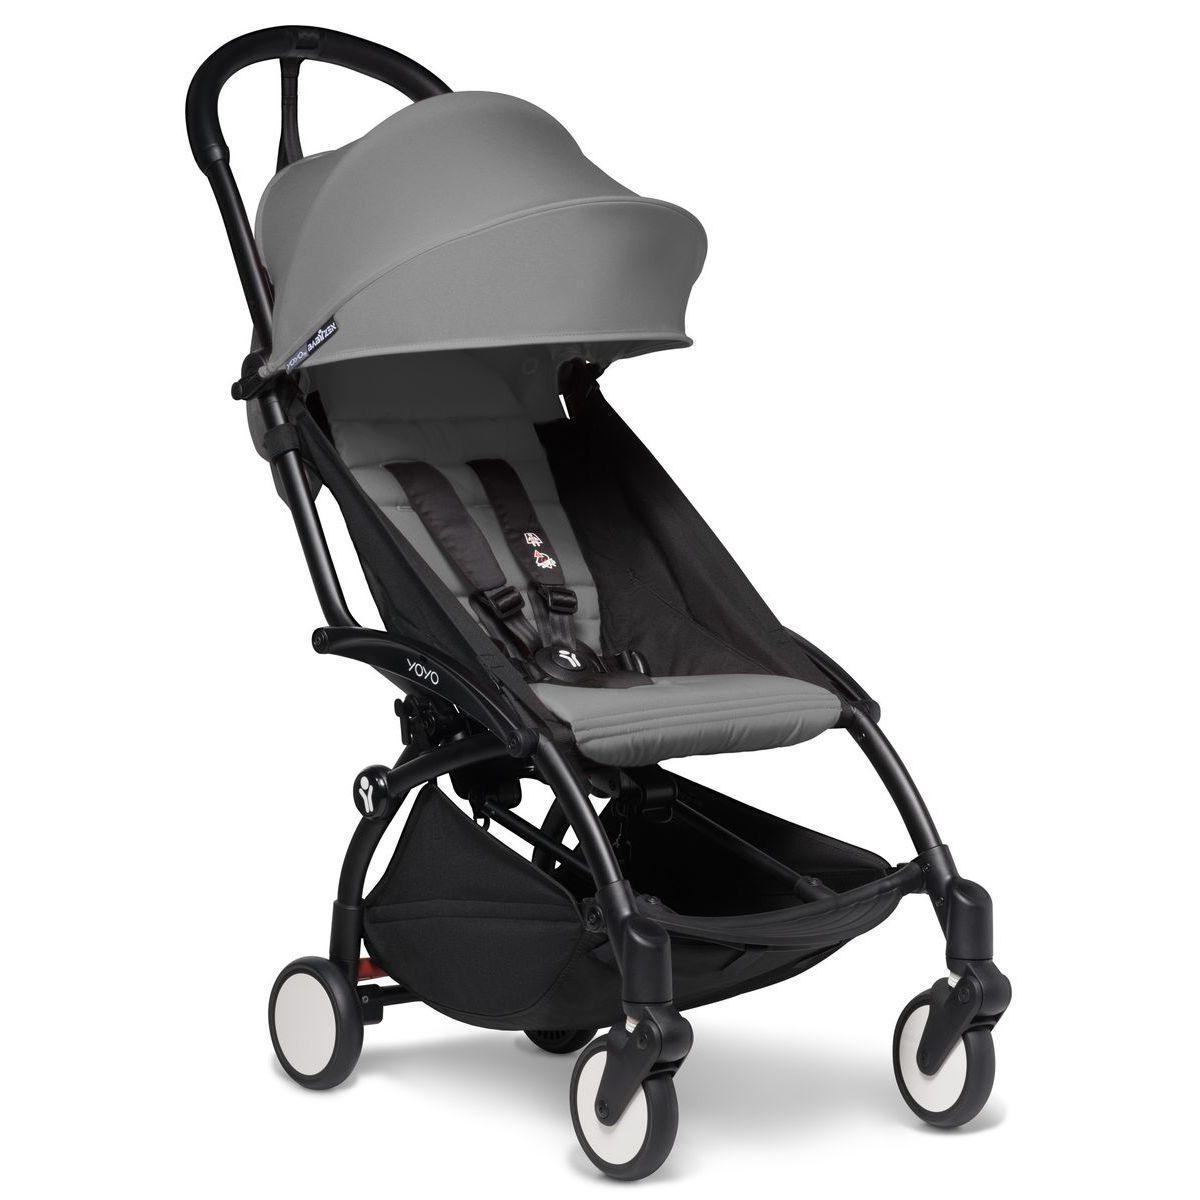 Kinderwagen BABYZEN YOYO² 6+ schwarz-grau